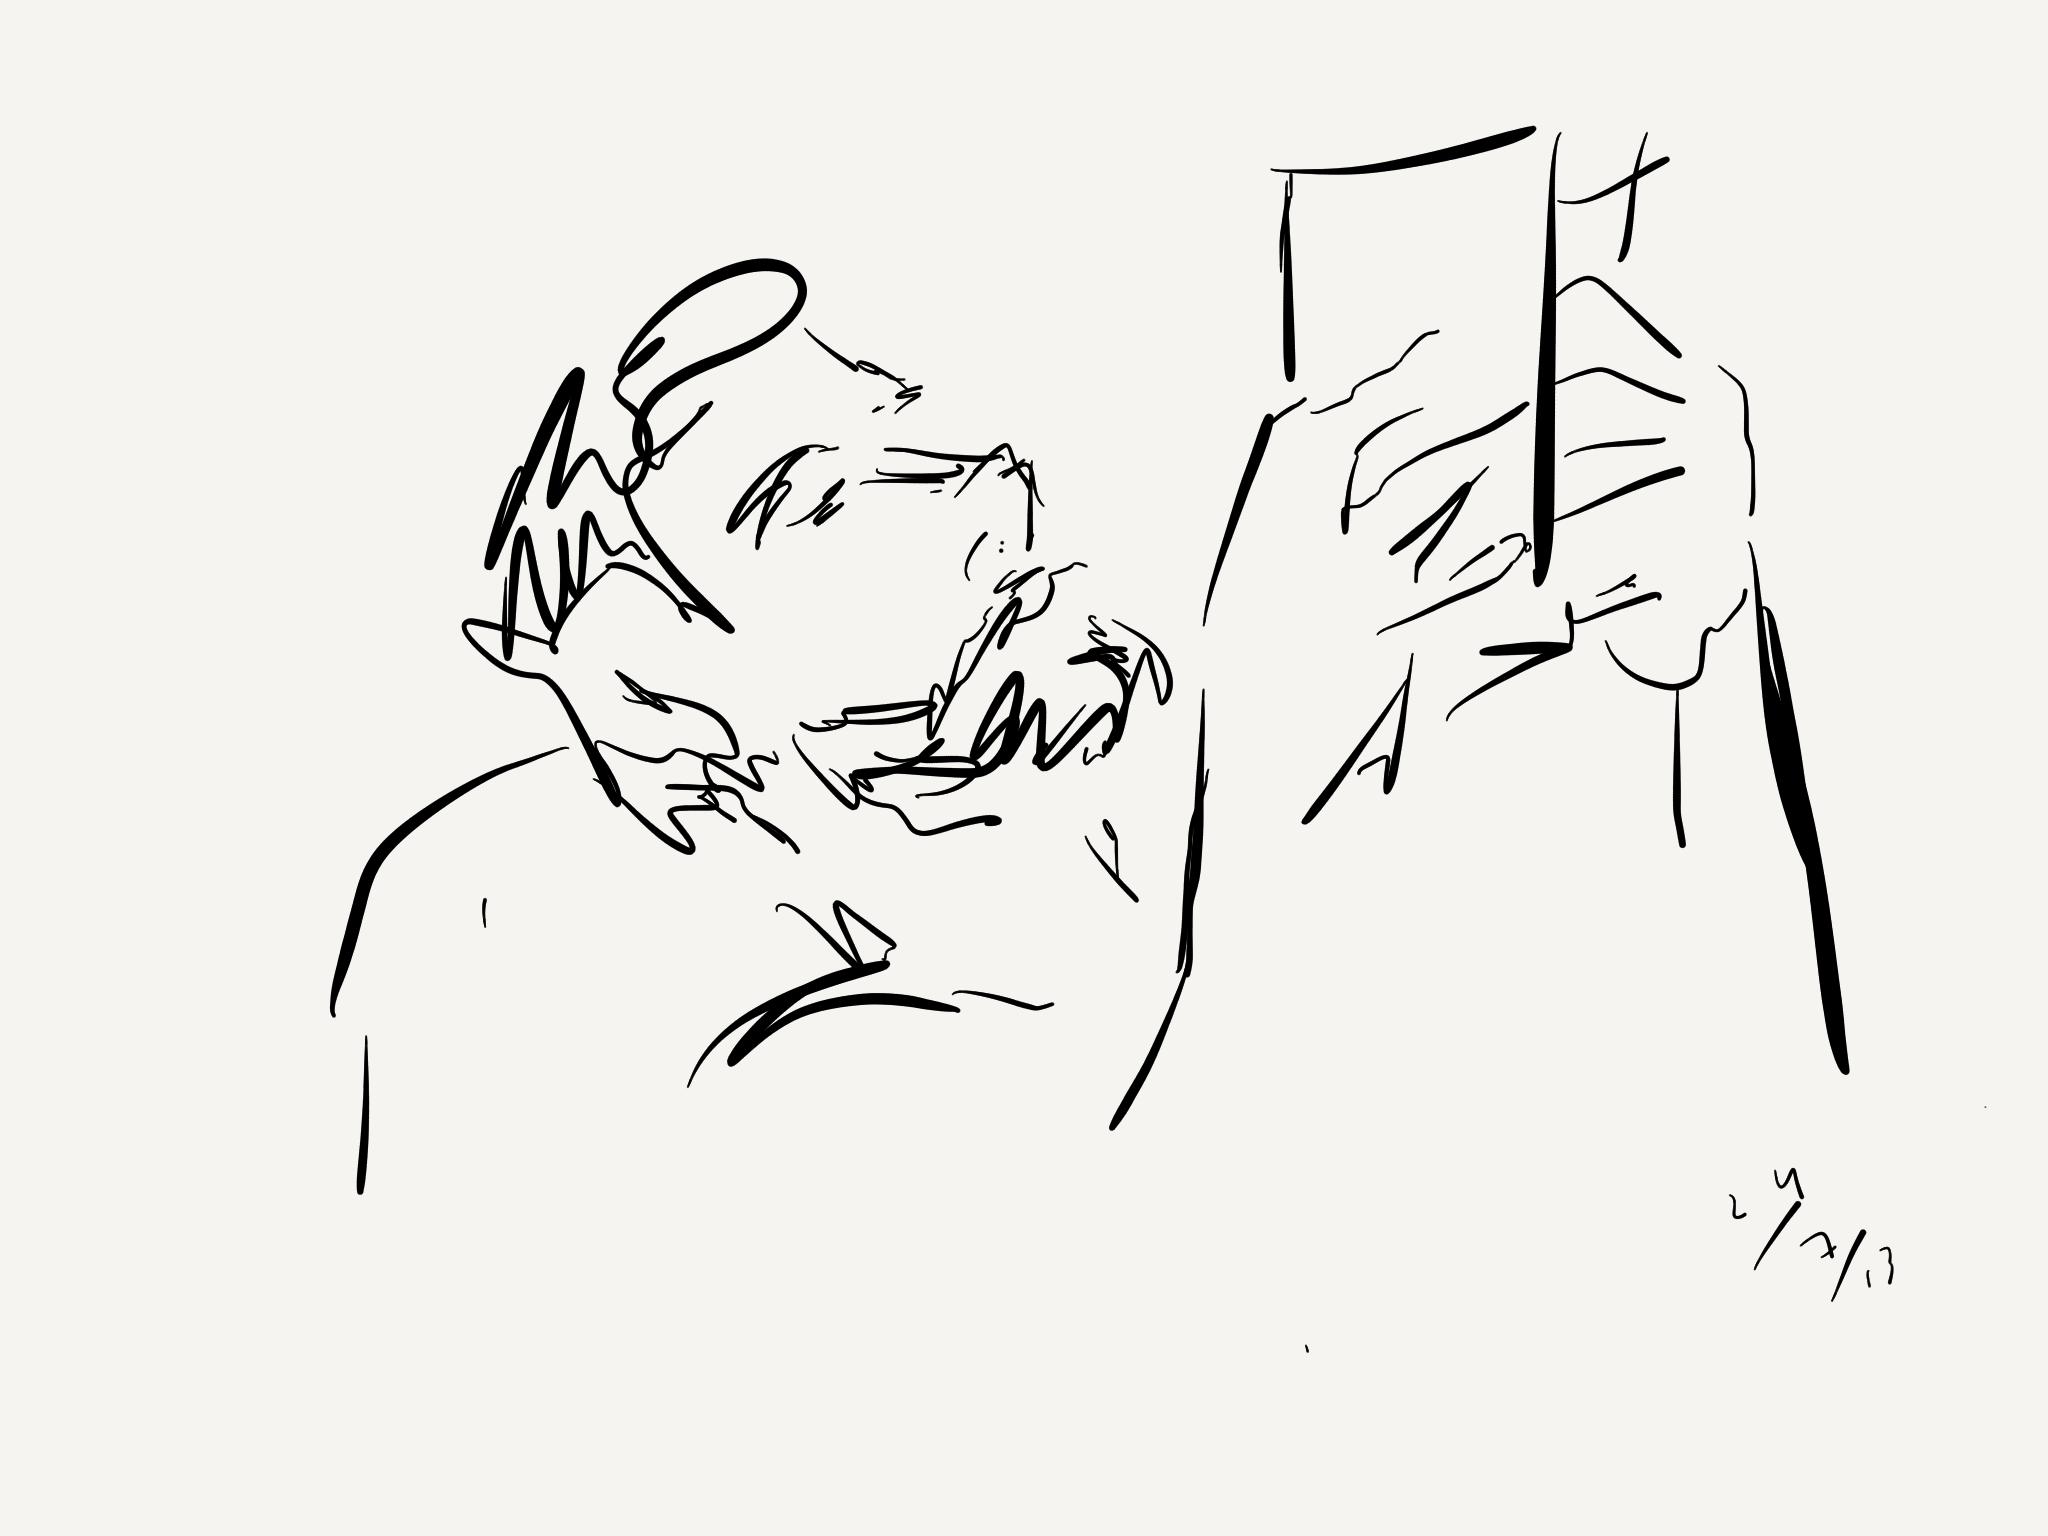 Vasco M. Barreto, reading